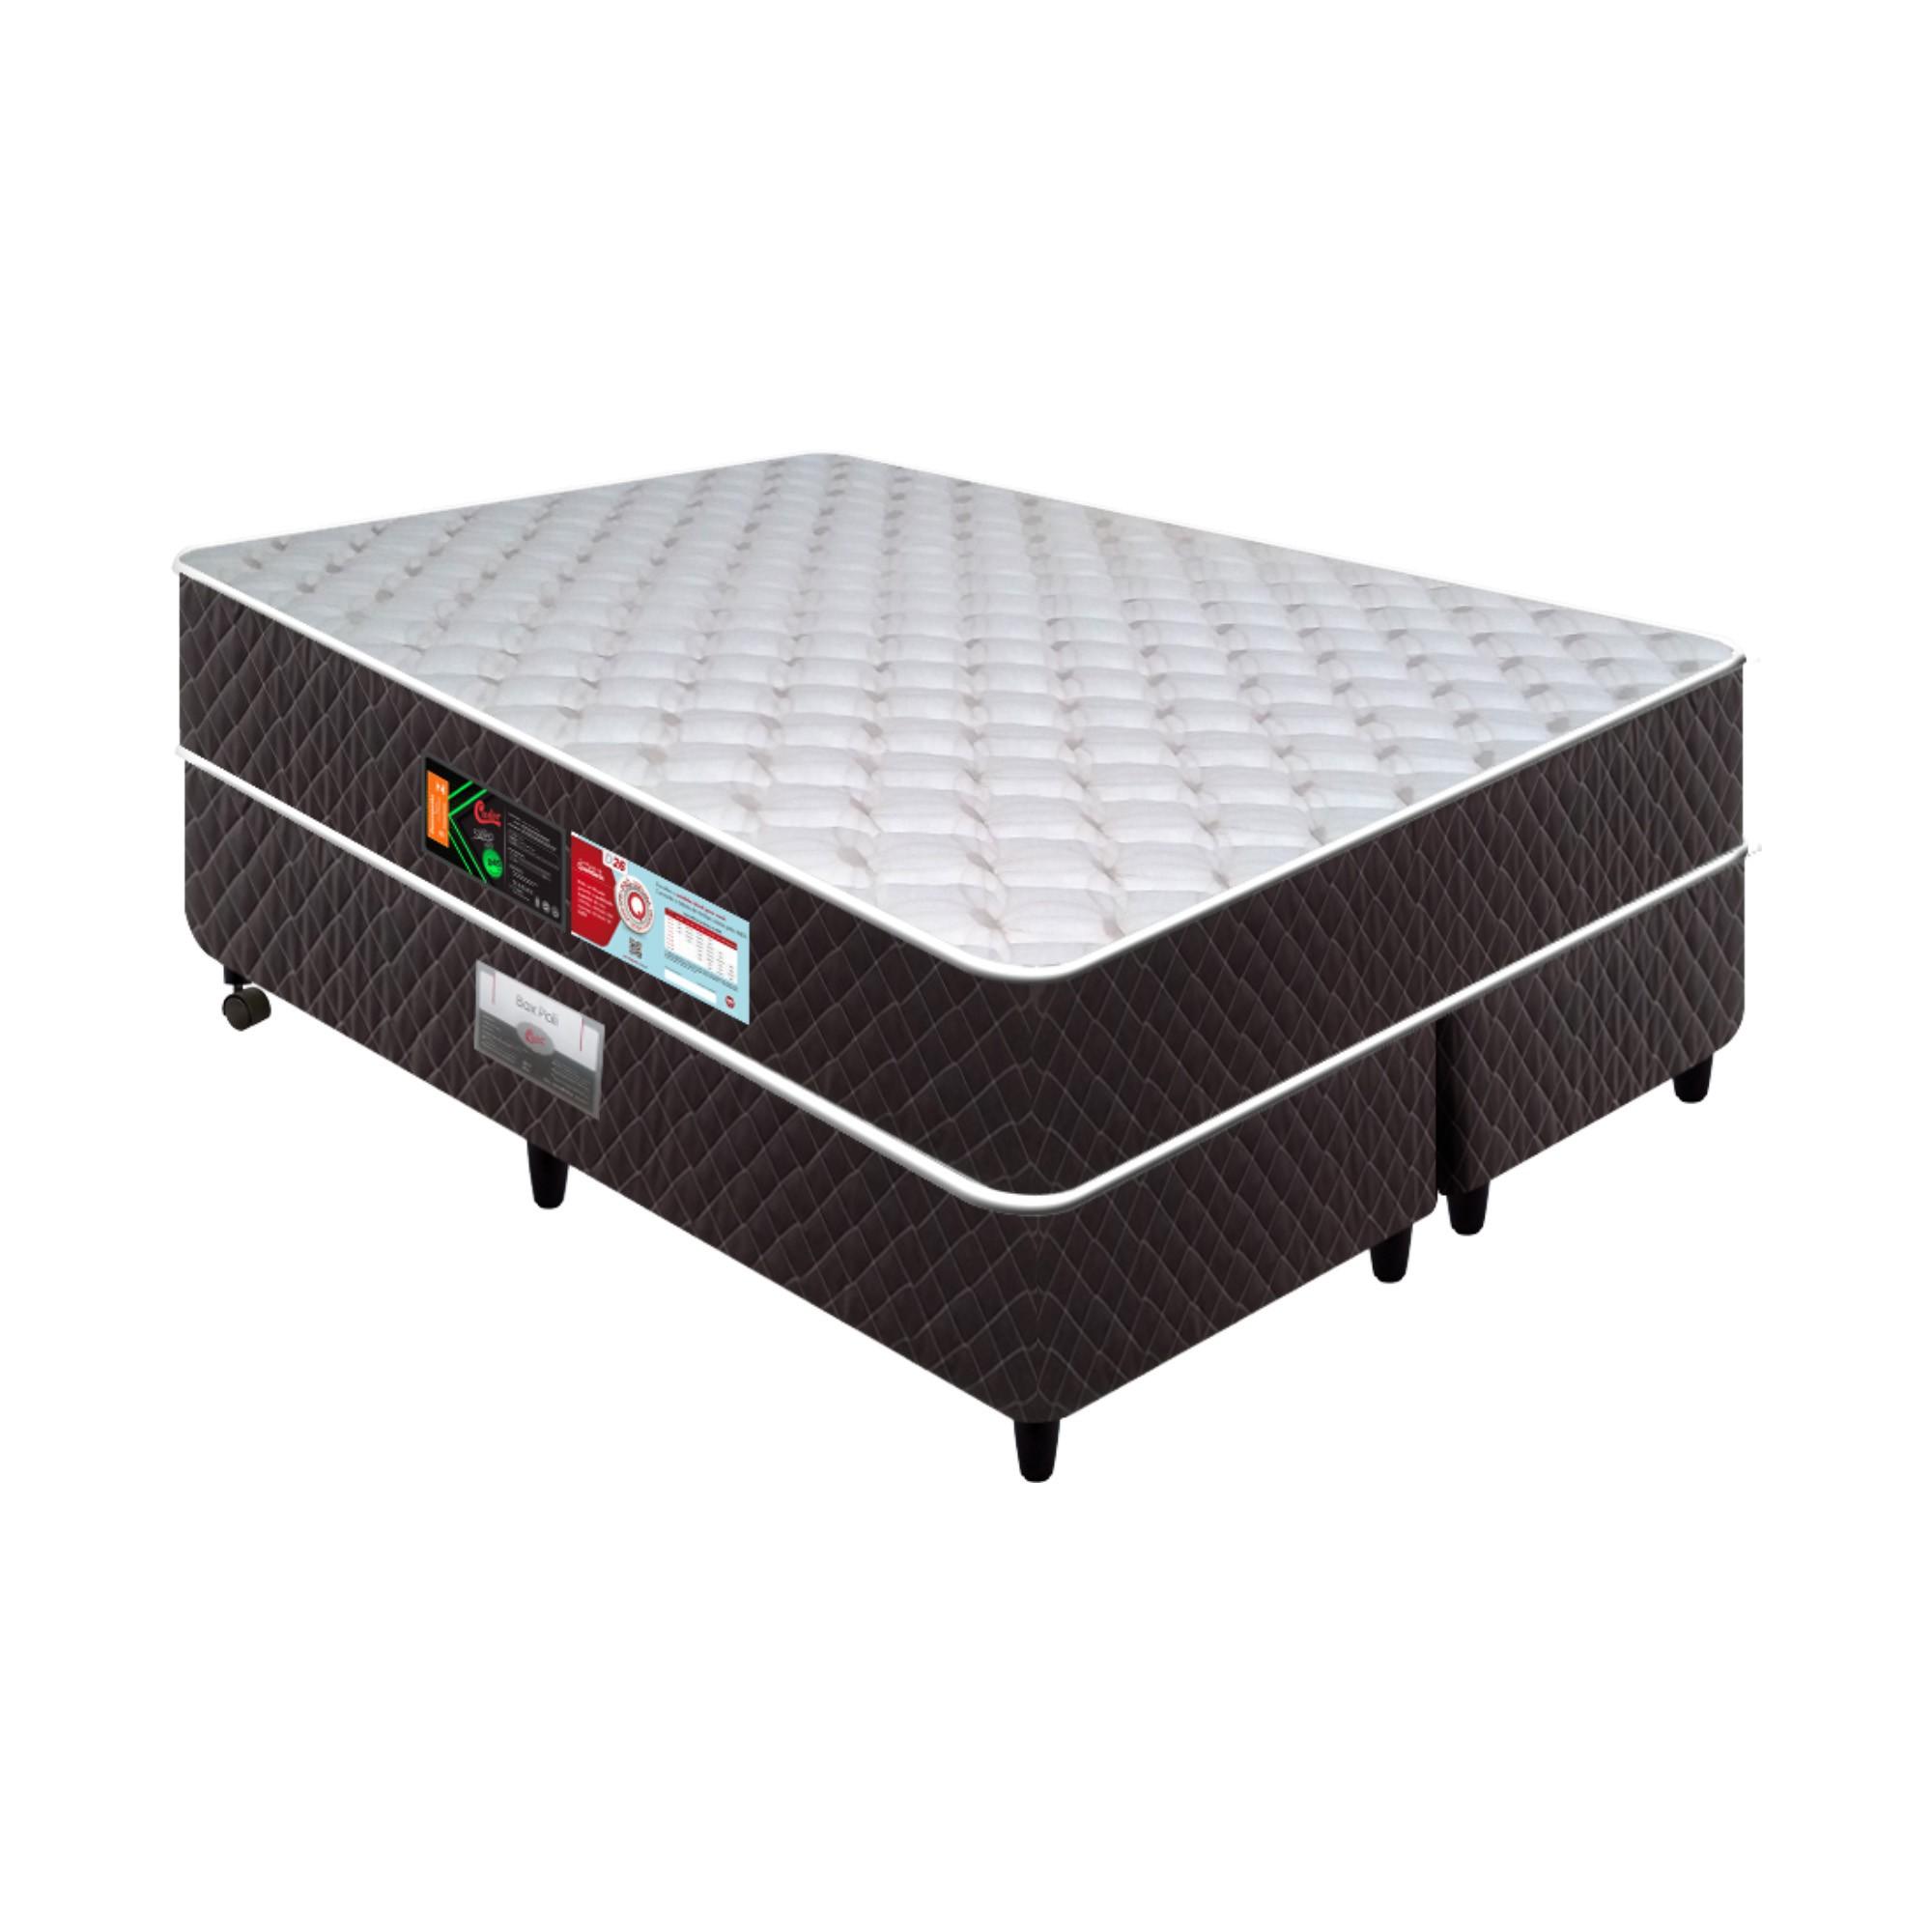 Conjunto Box Castor Sleep Max D45 [Solteiro 078 x 188 cm]